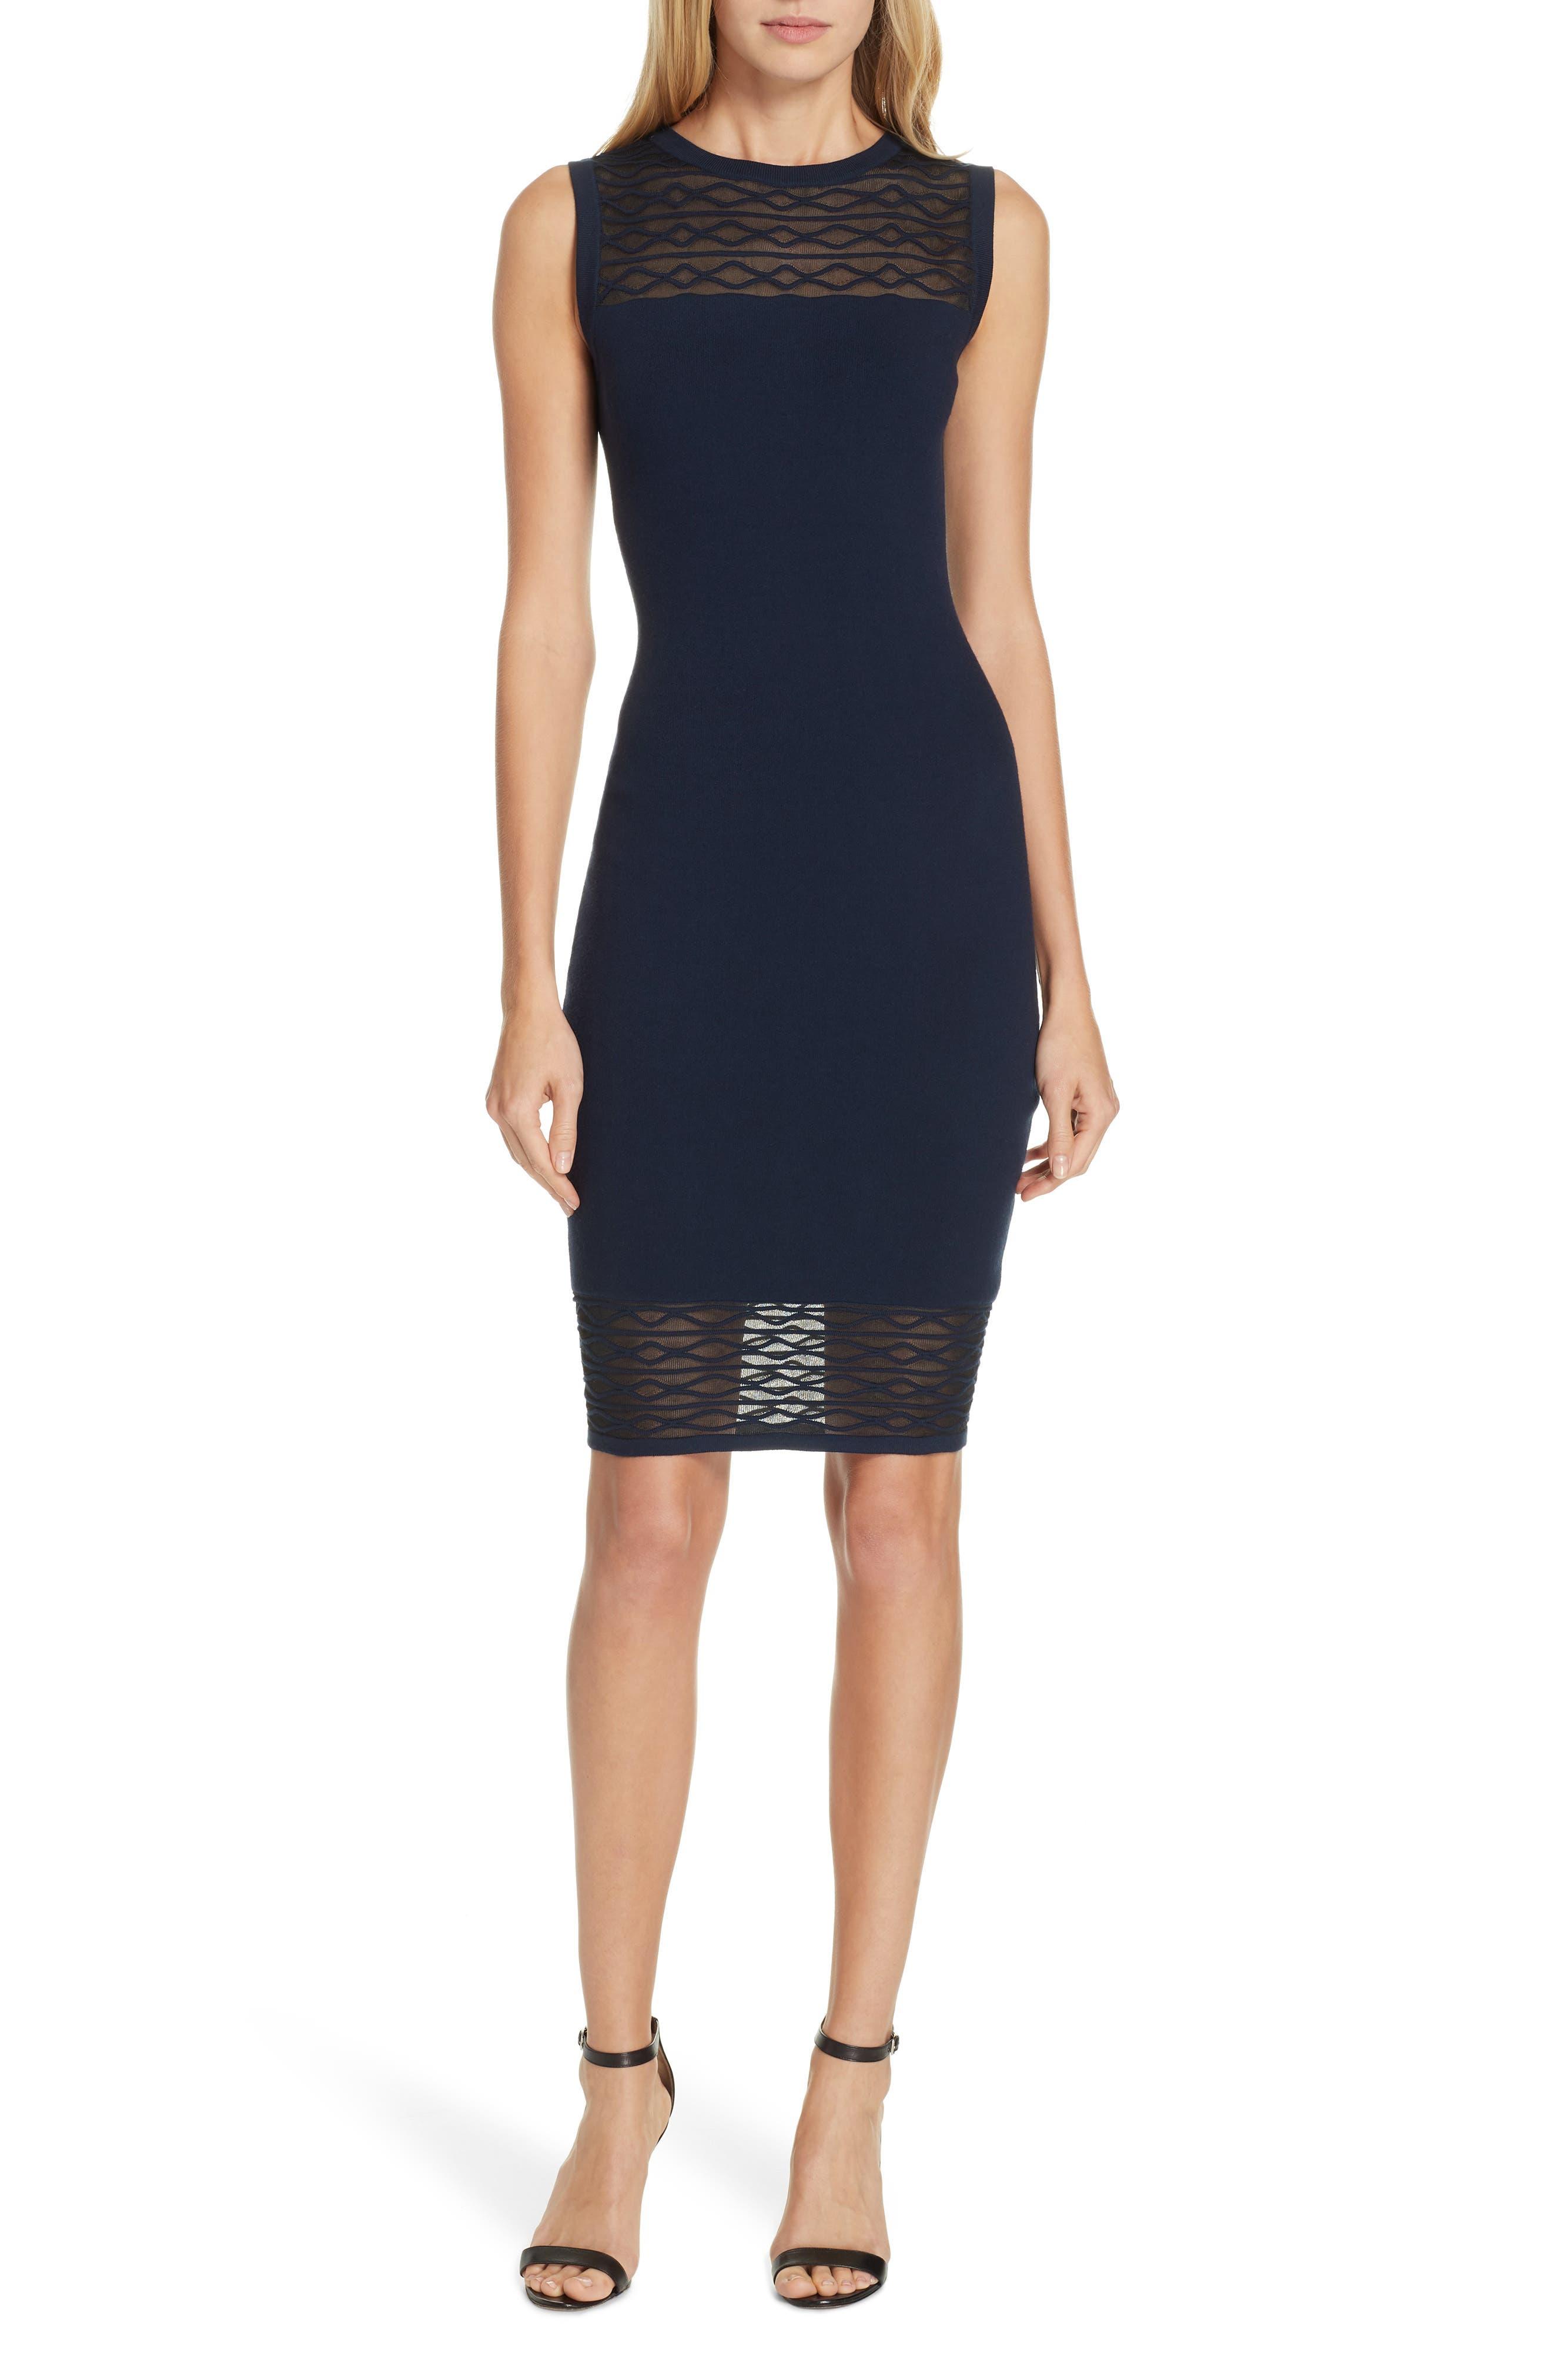 Milly Translucent Texture Sheath Dress, Size Petite - Blue